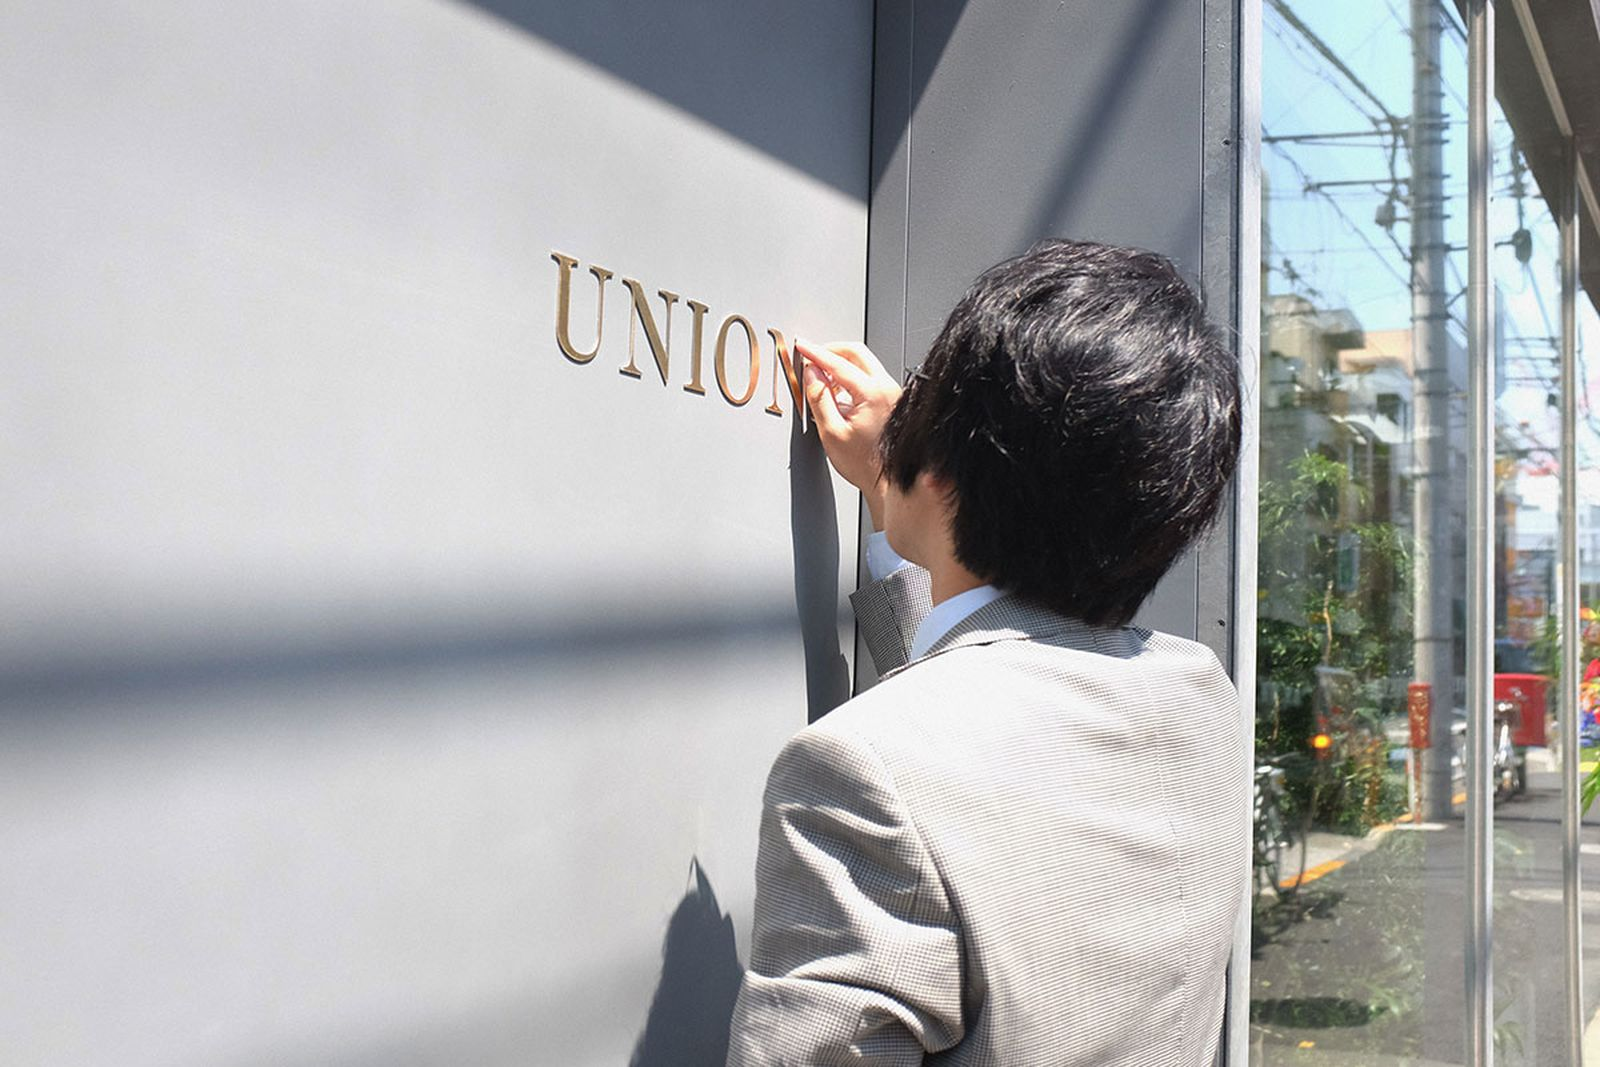 Union-Tokyo-Japan-Highsnobiety-05